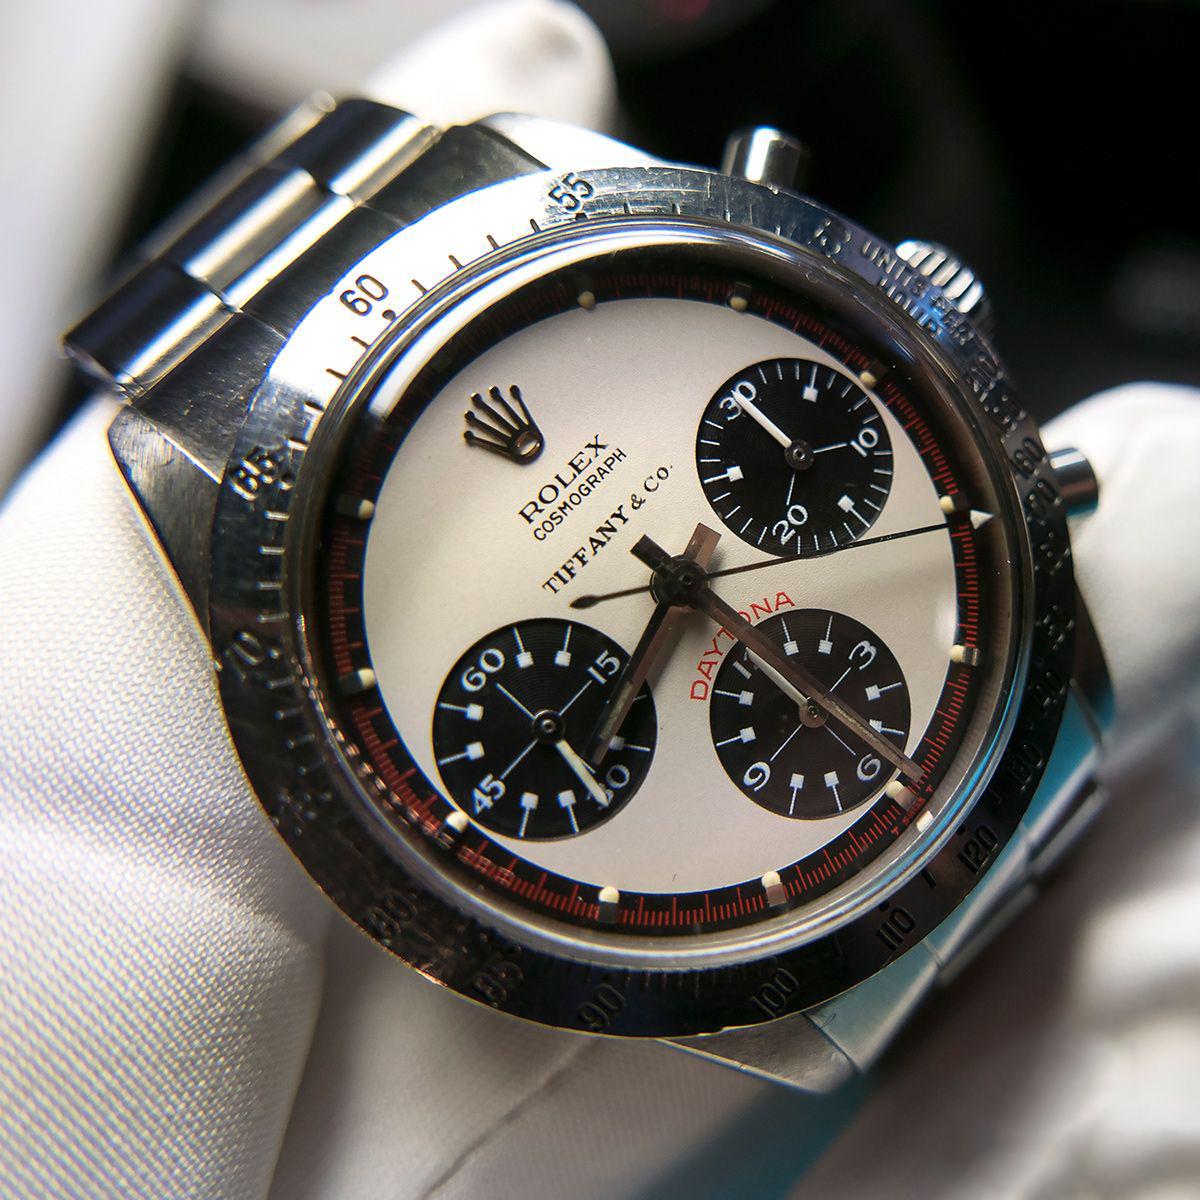 Paul Newman's Rolex Daytona